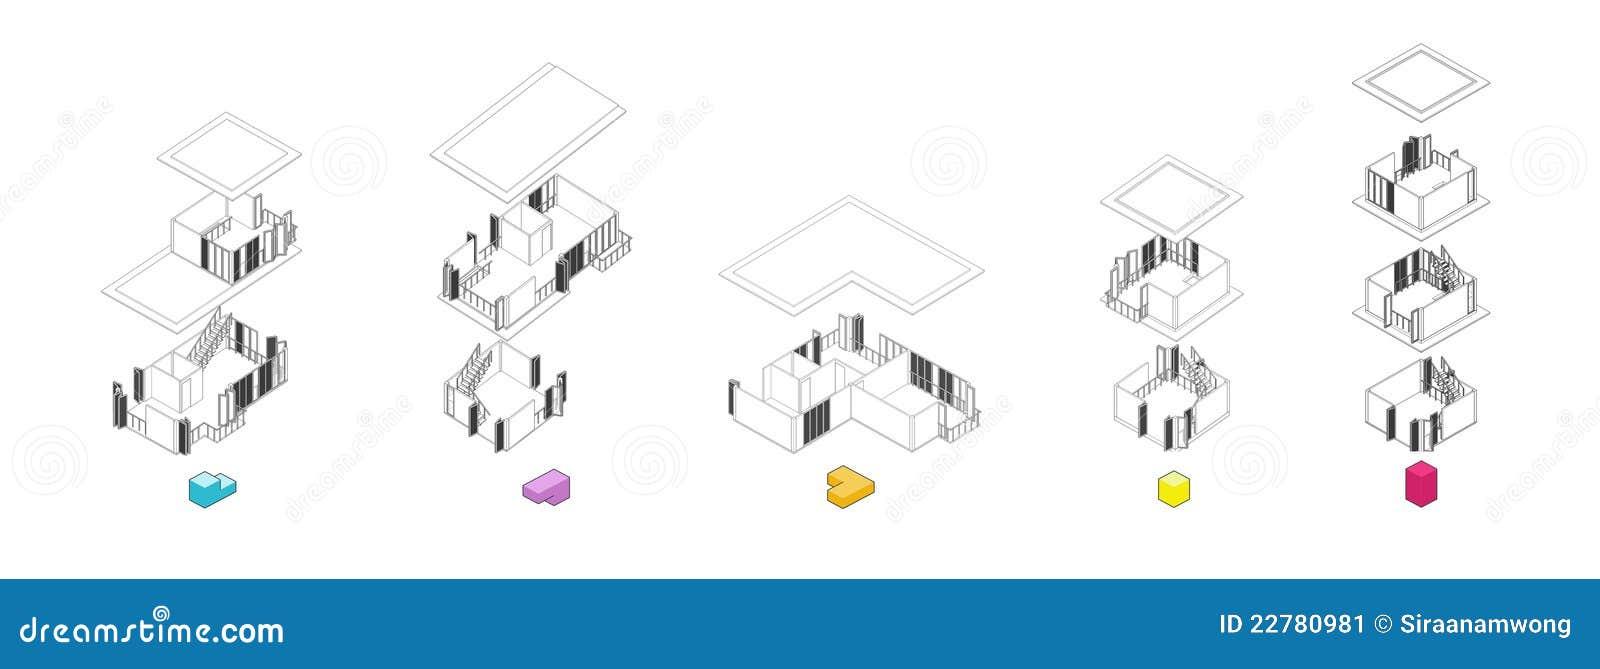 construction essay ideas